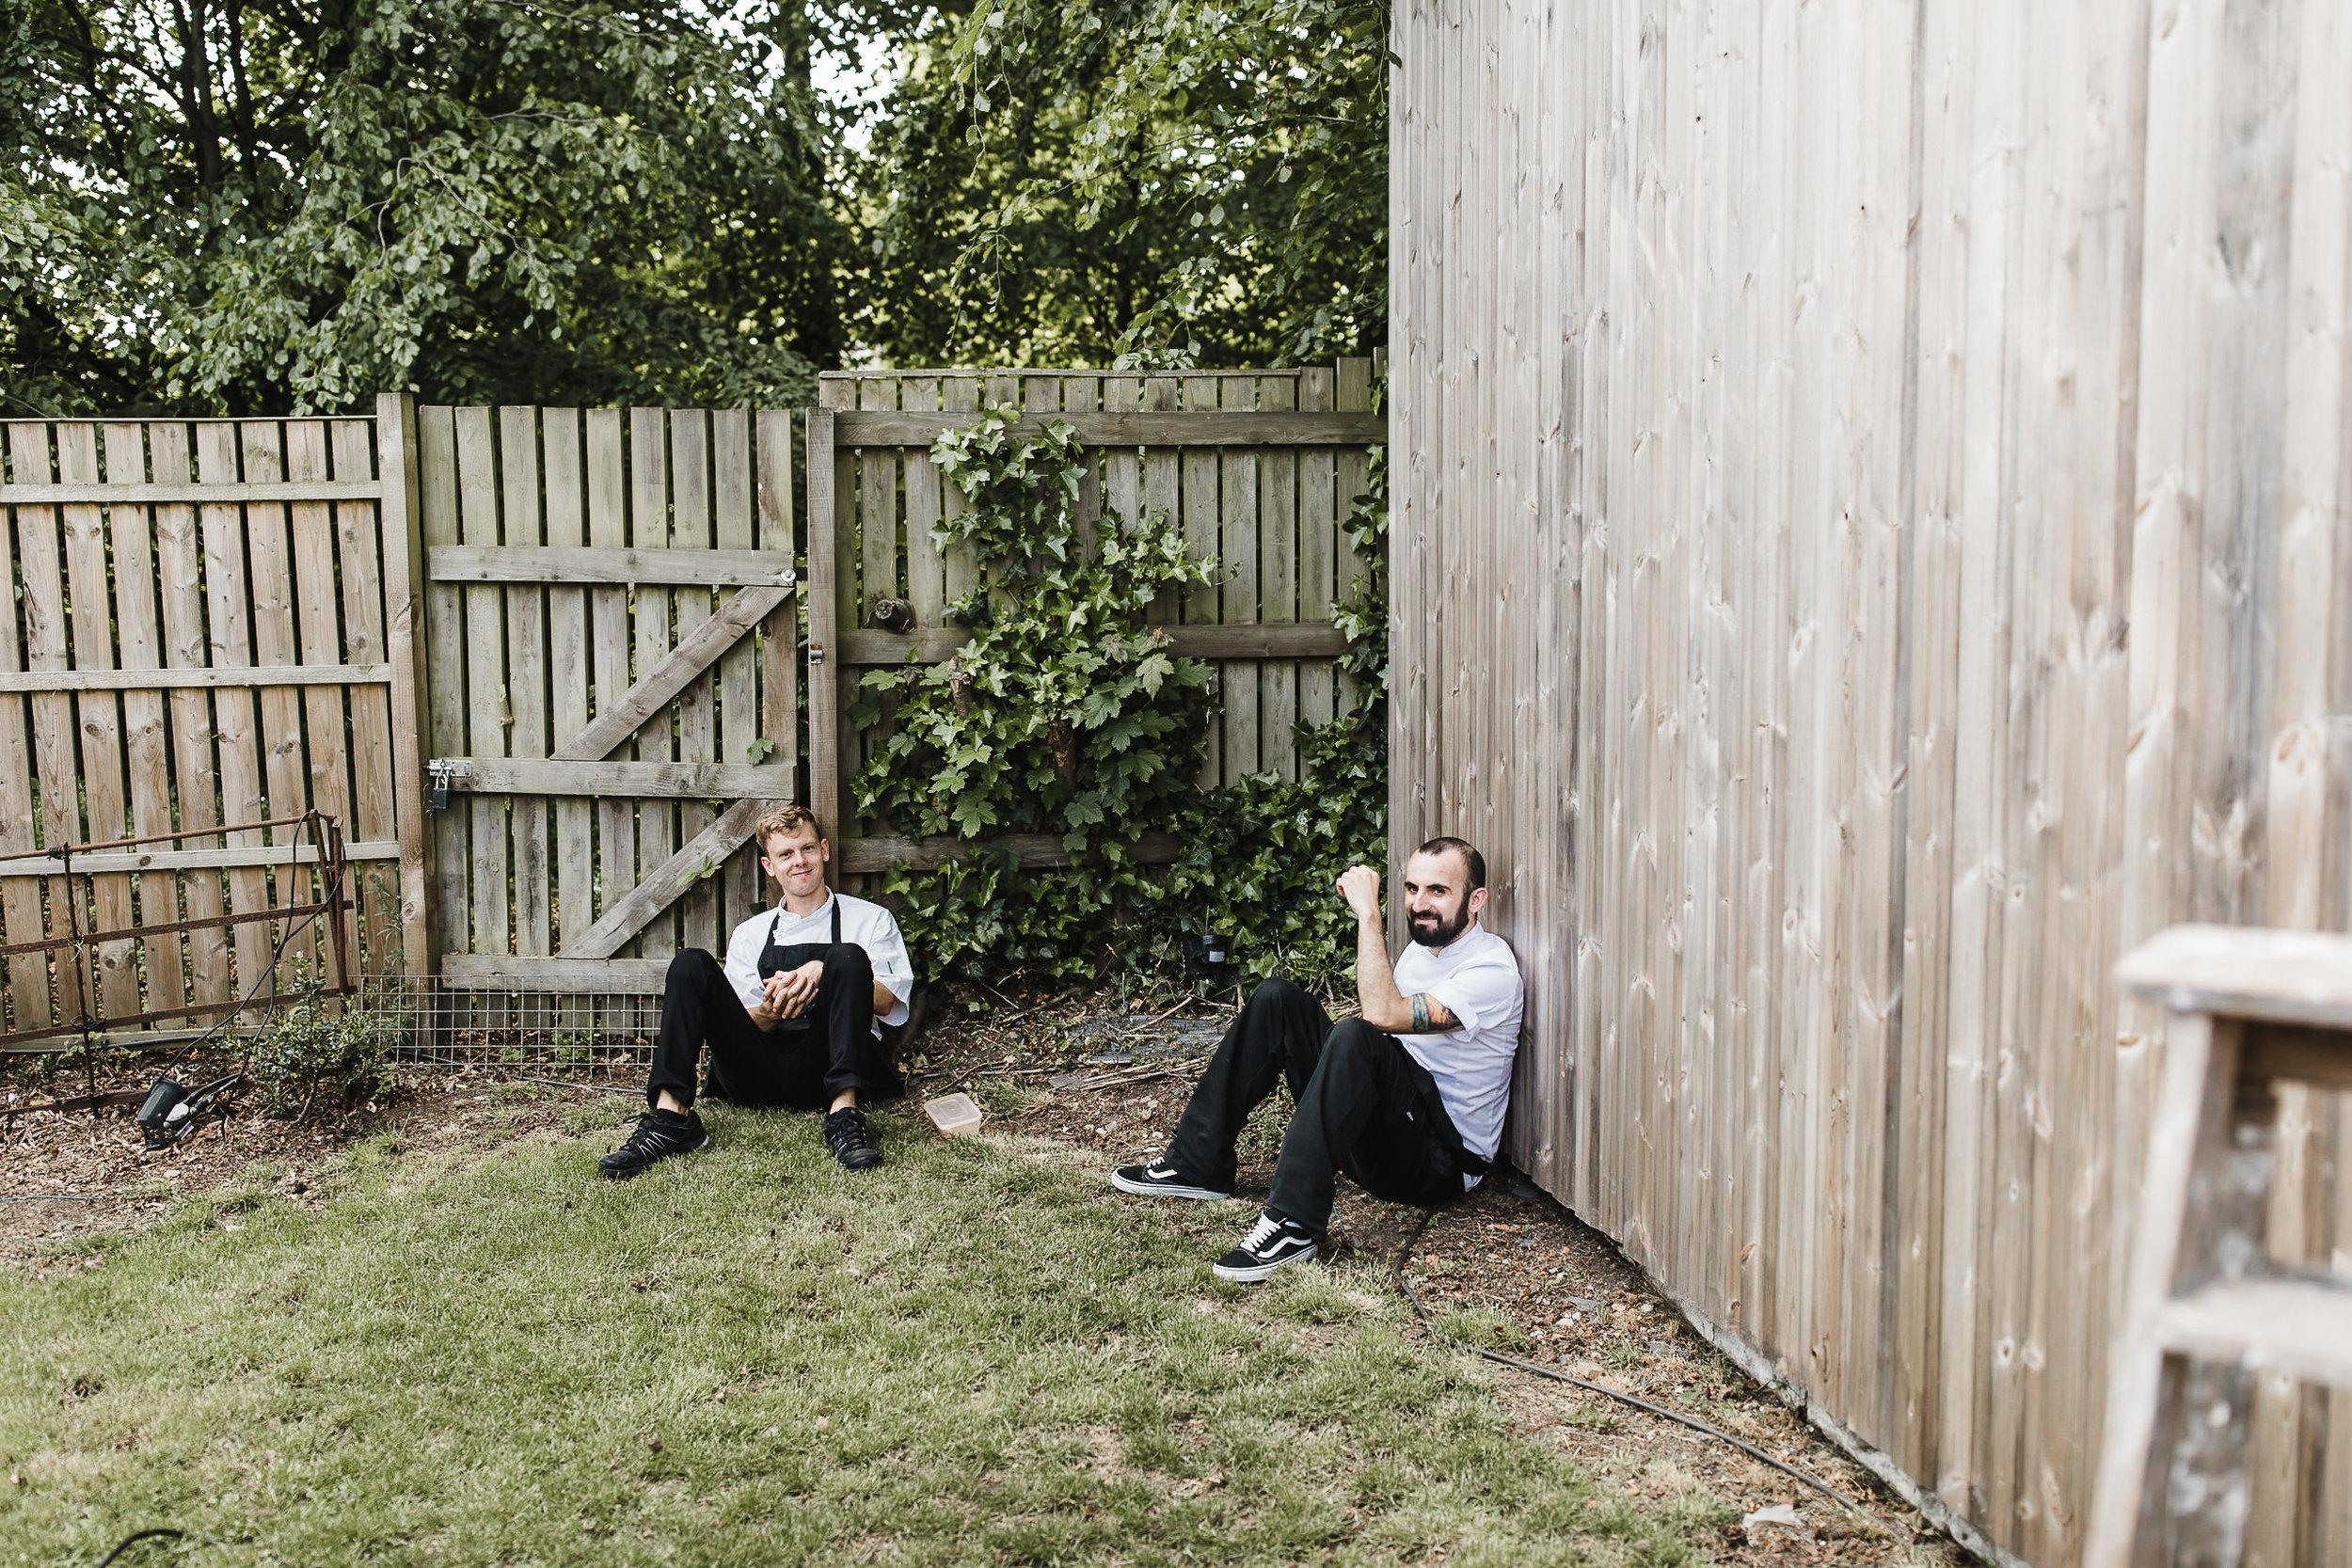 Roundhay-Leeds-Backyard-Wedding-Becs-Chris-149.jpg